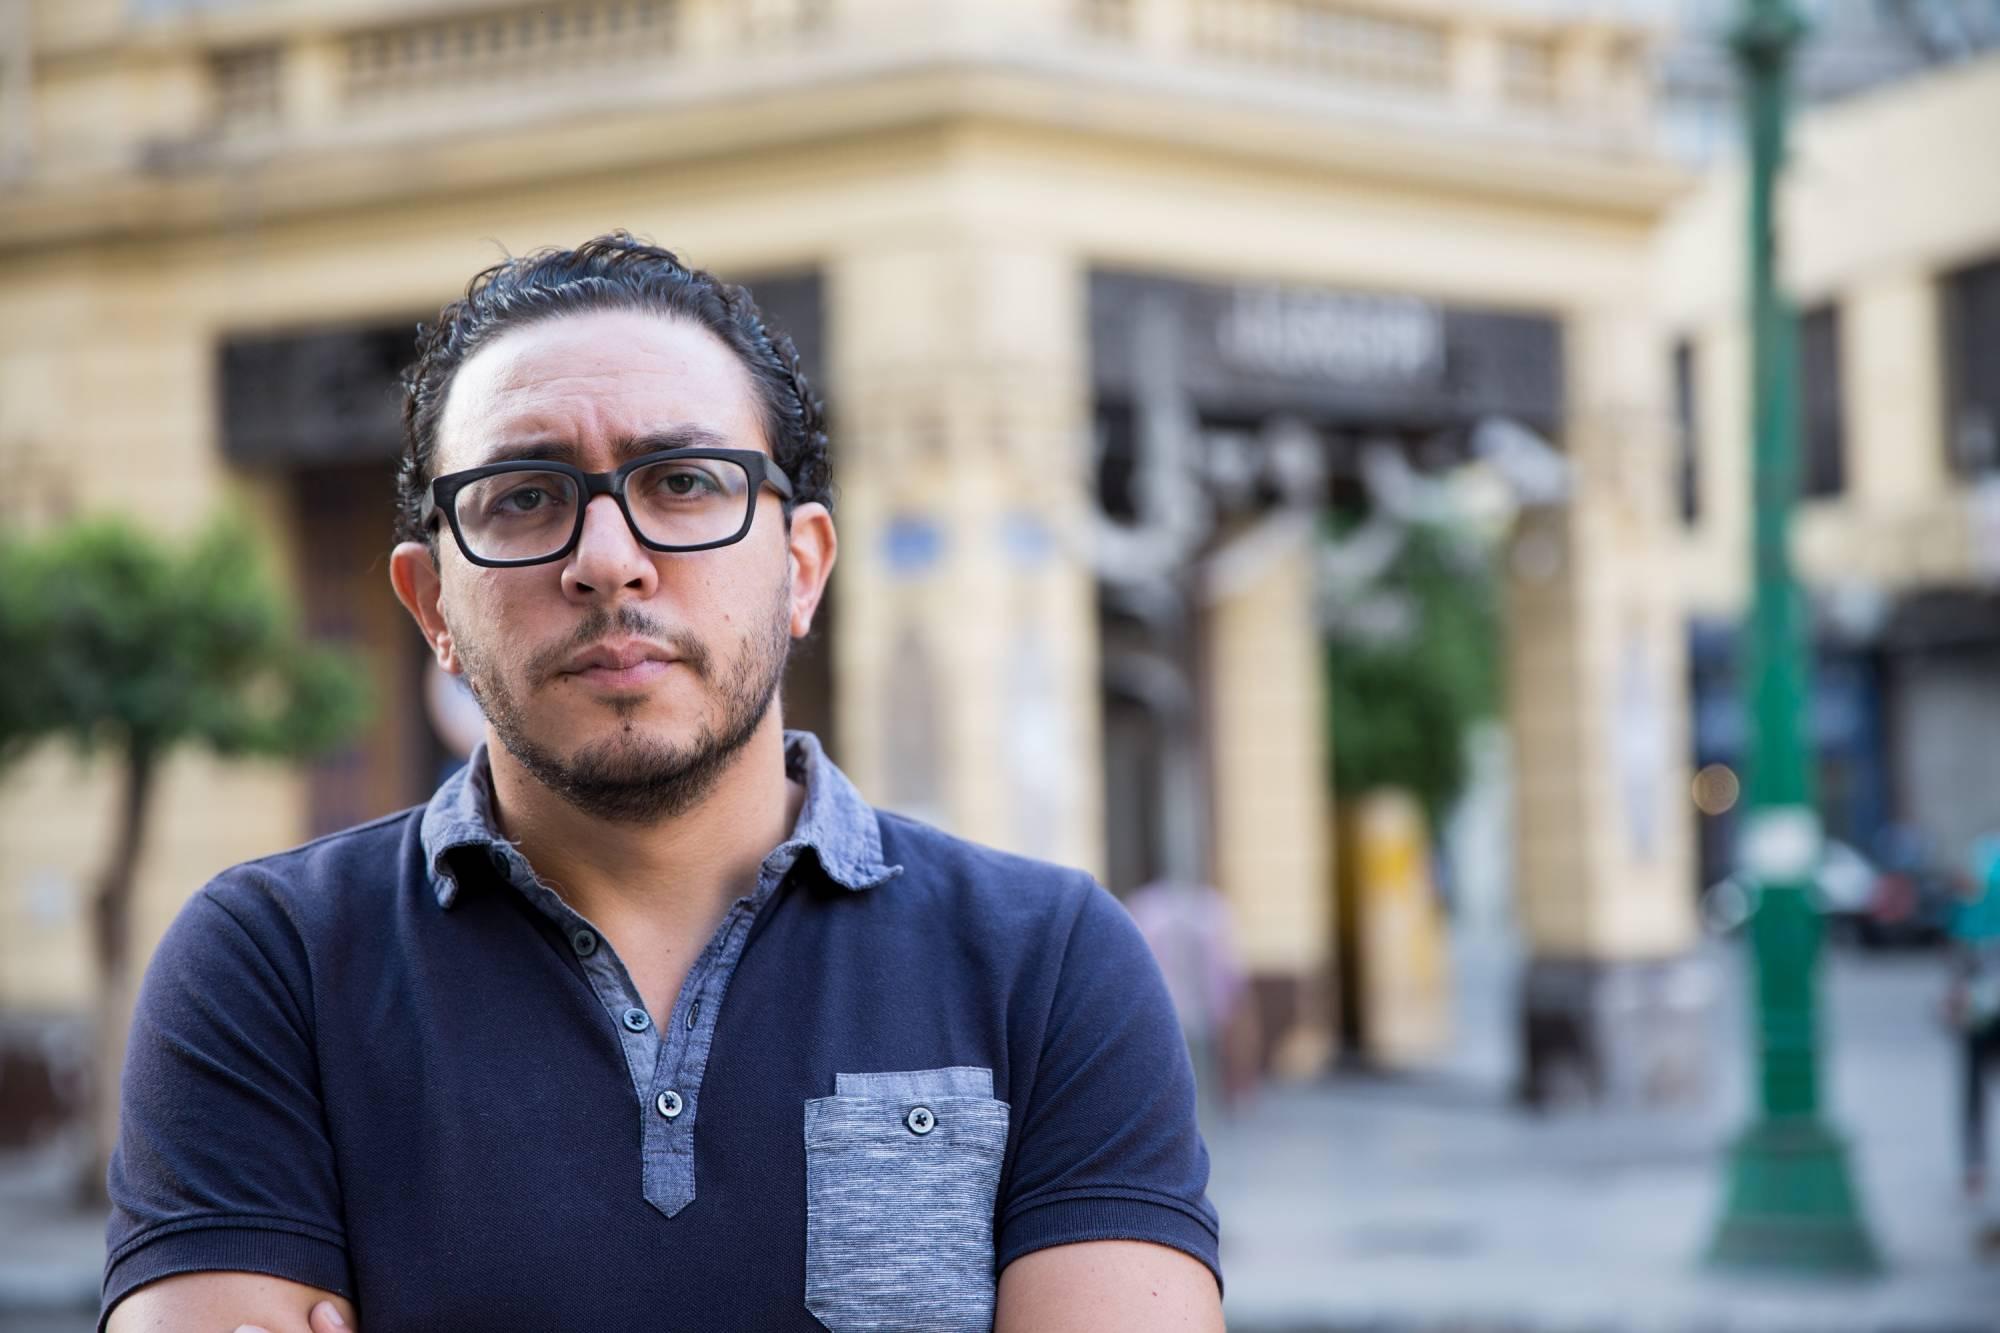 Haytham Nawar, Cairo, 2017 (Image: Mostafa Abdel Aty)